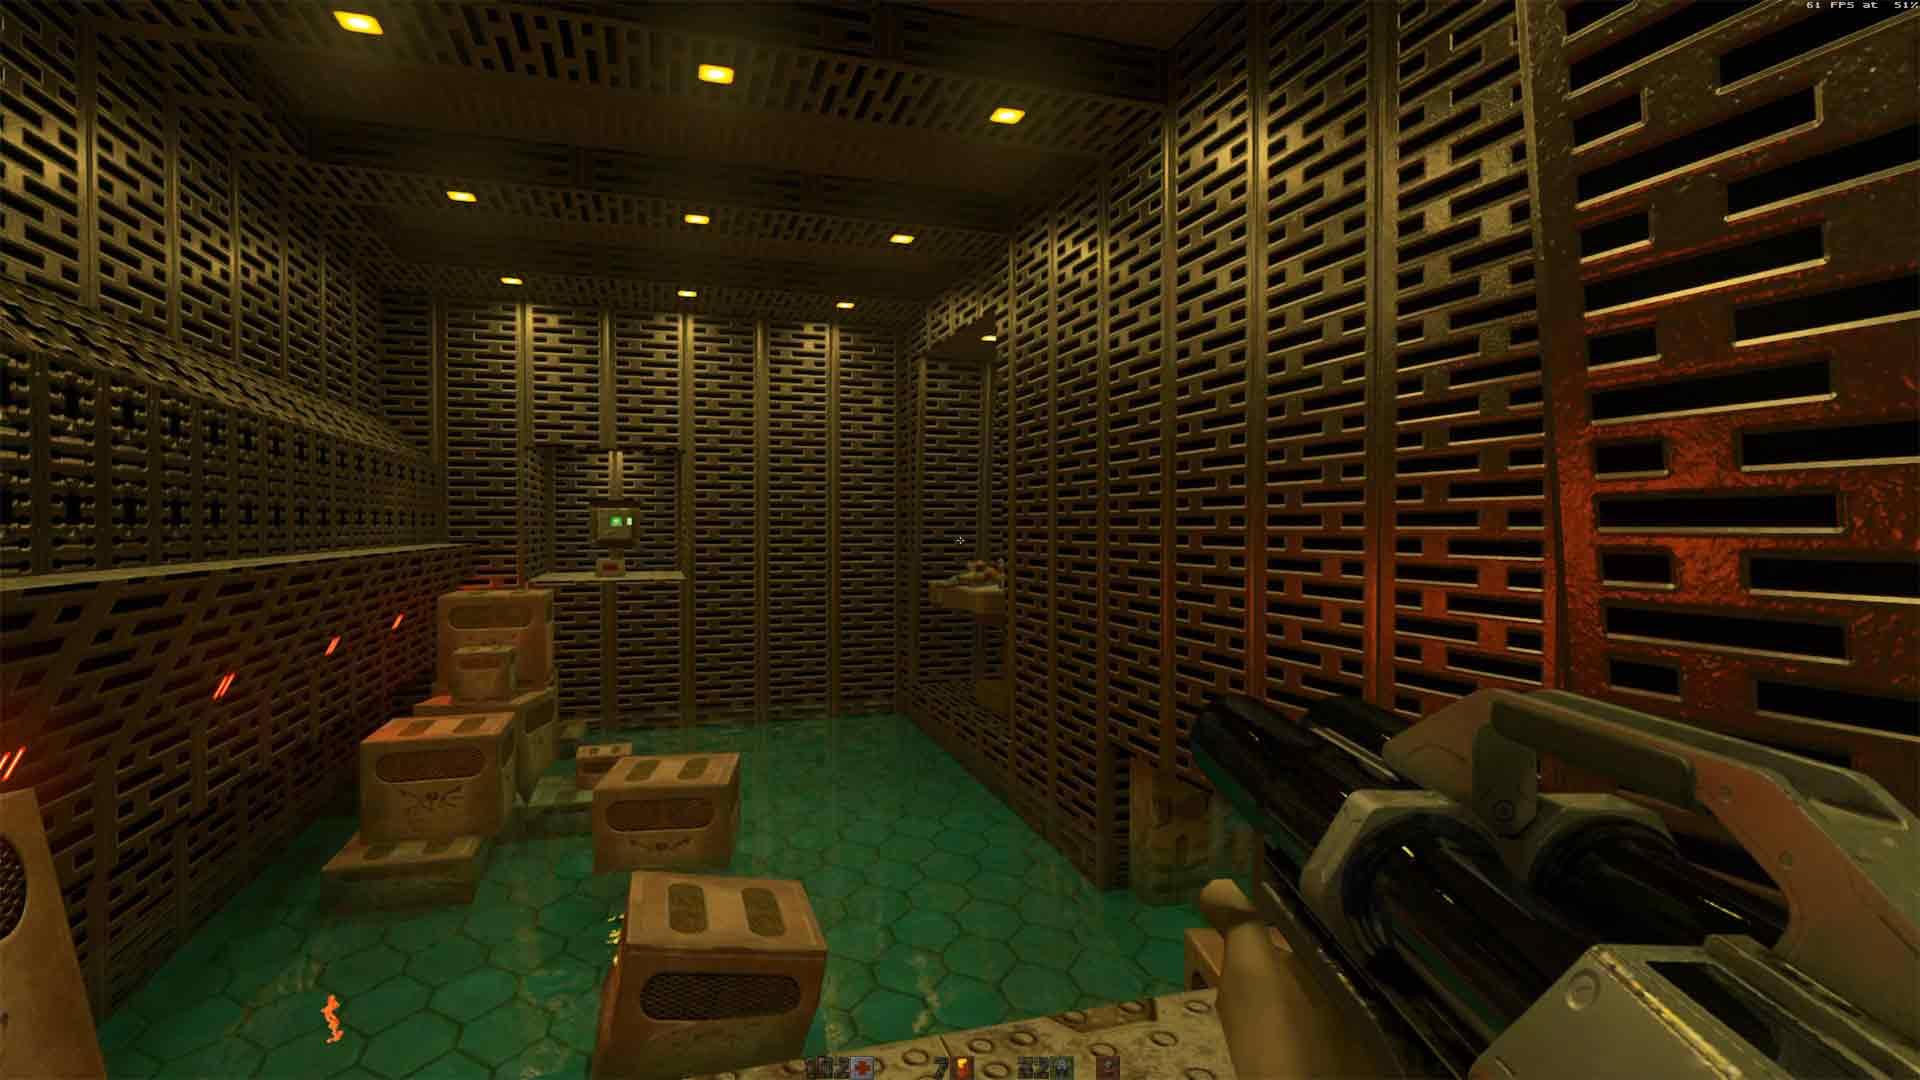 Quake 2 ray tracing